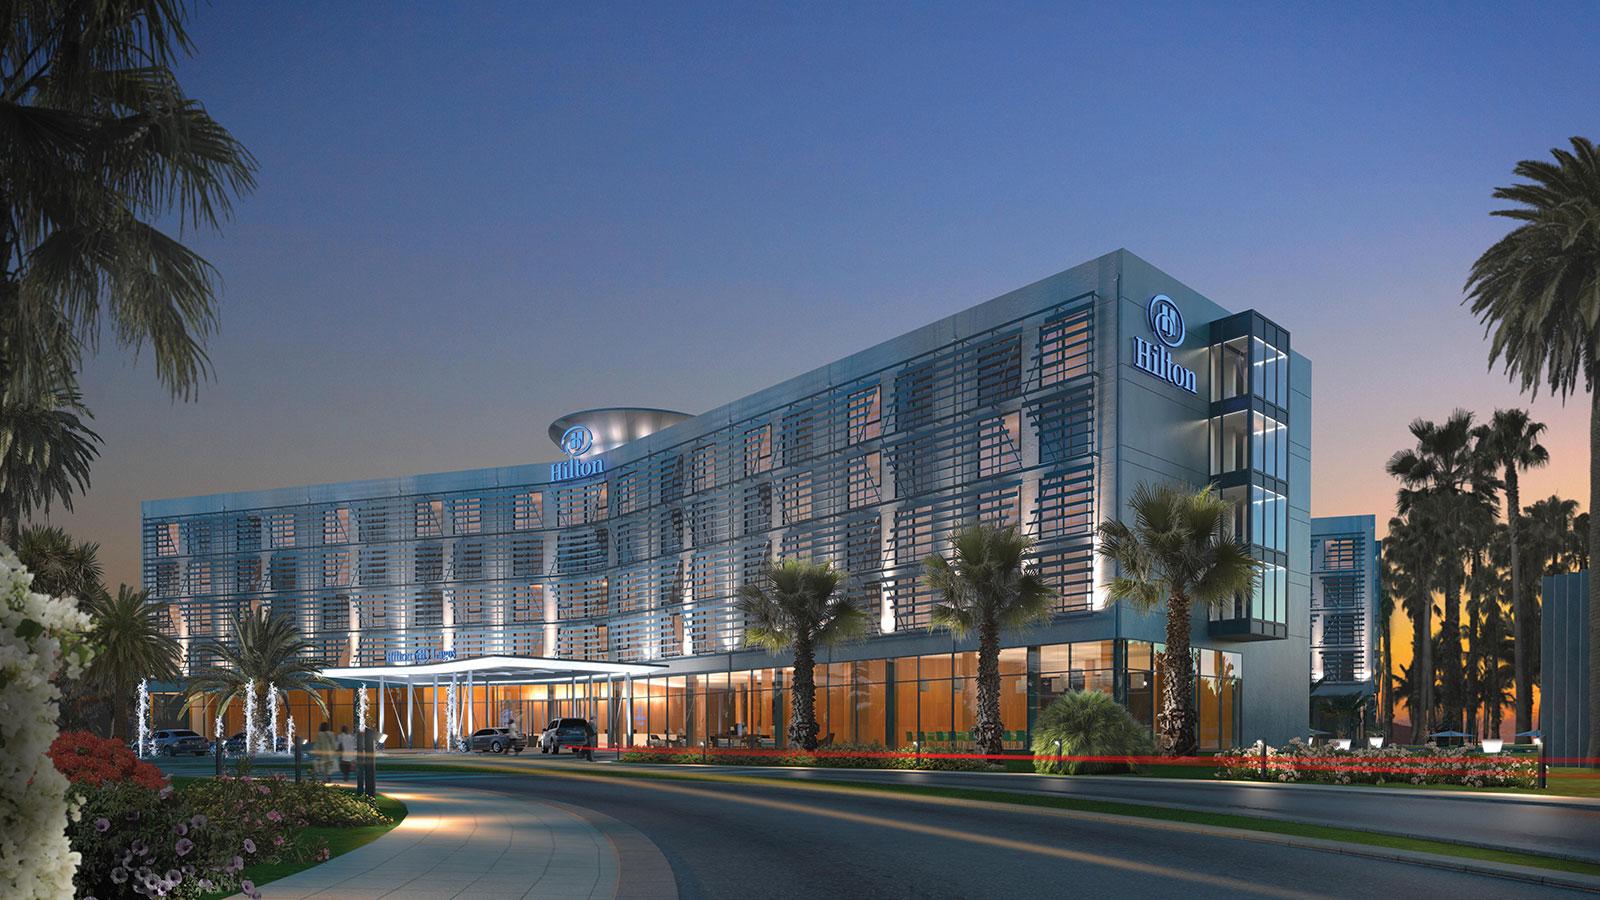 Hilton дубай недвижимость дубае